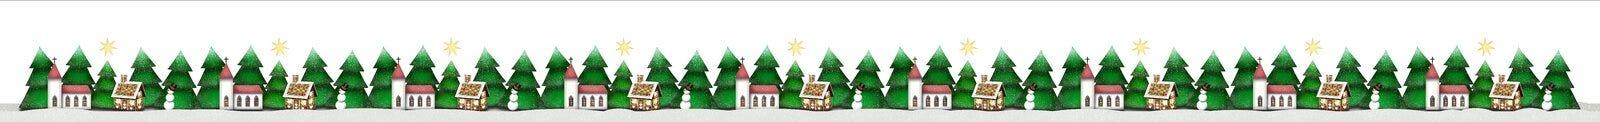 Christmas border isolated on white stock illustration